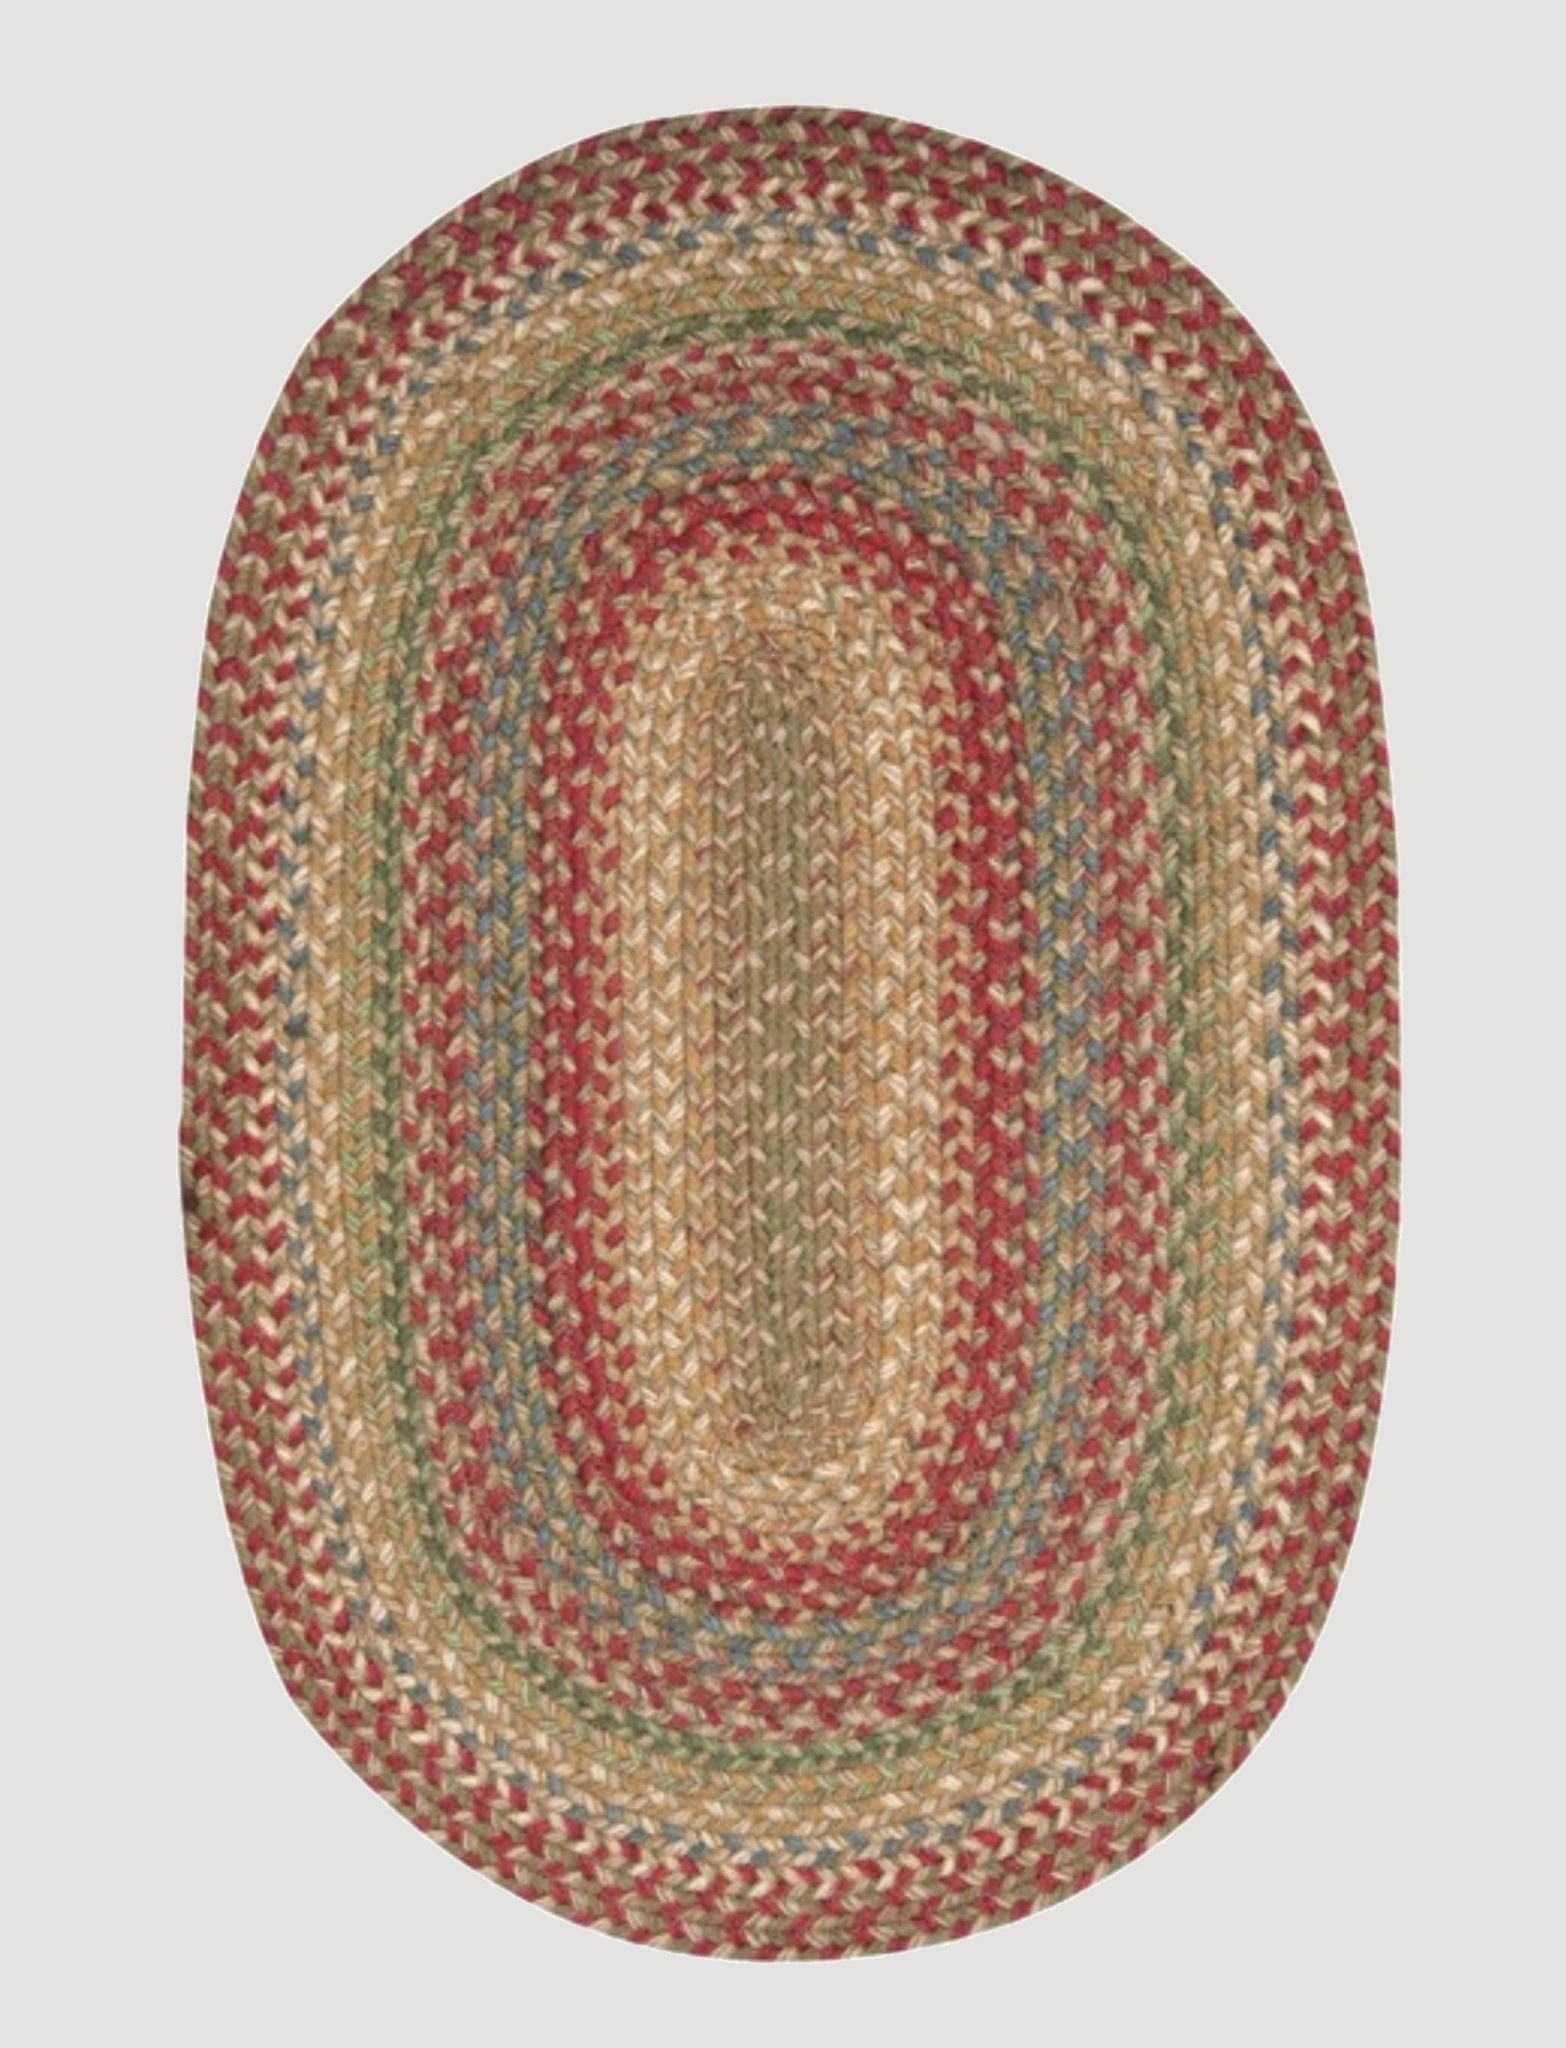 Homespice Decor Azalea Jute Braided Rug